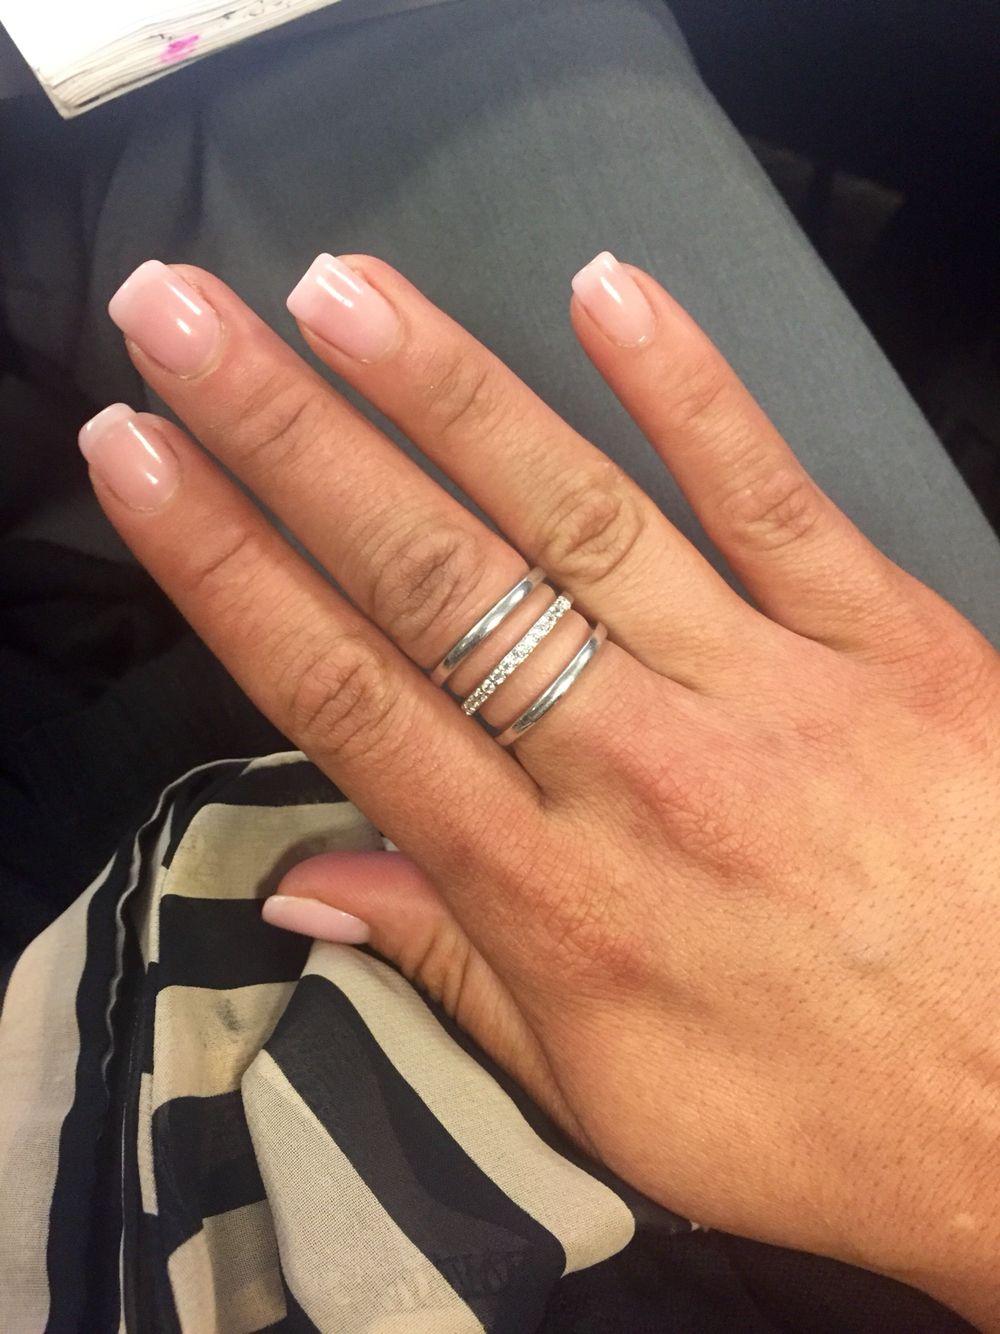 My first nexgen. Nails on point! | Nails | Pinterest | Manicure ...